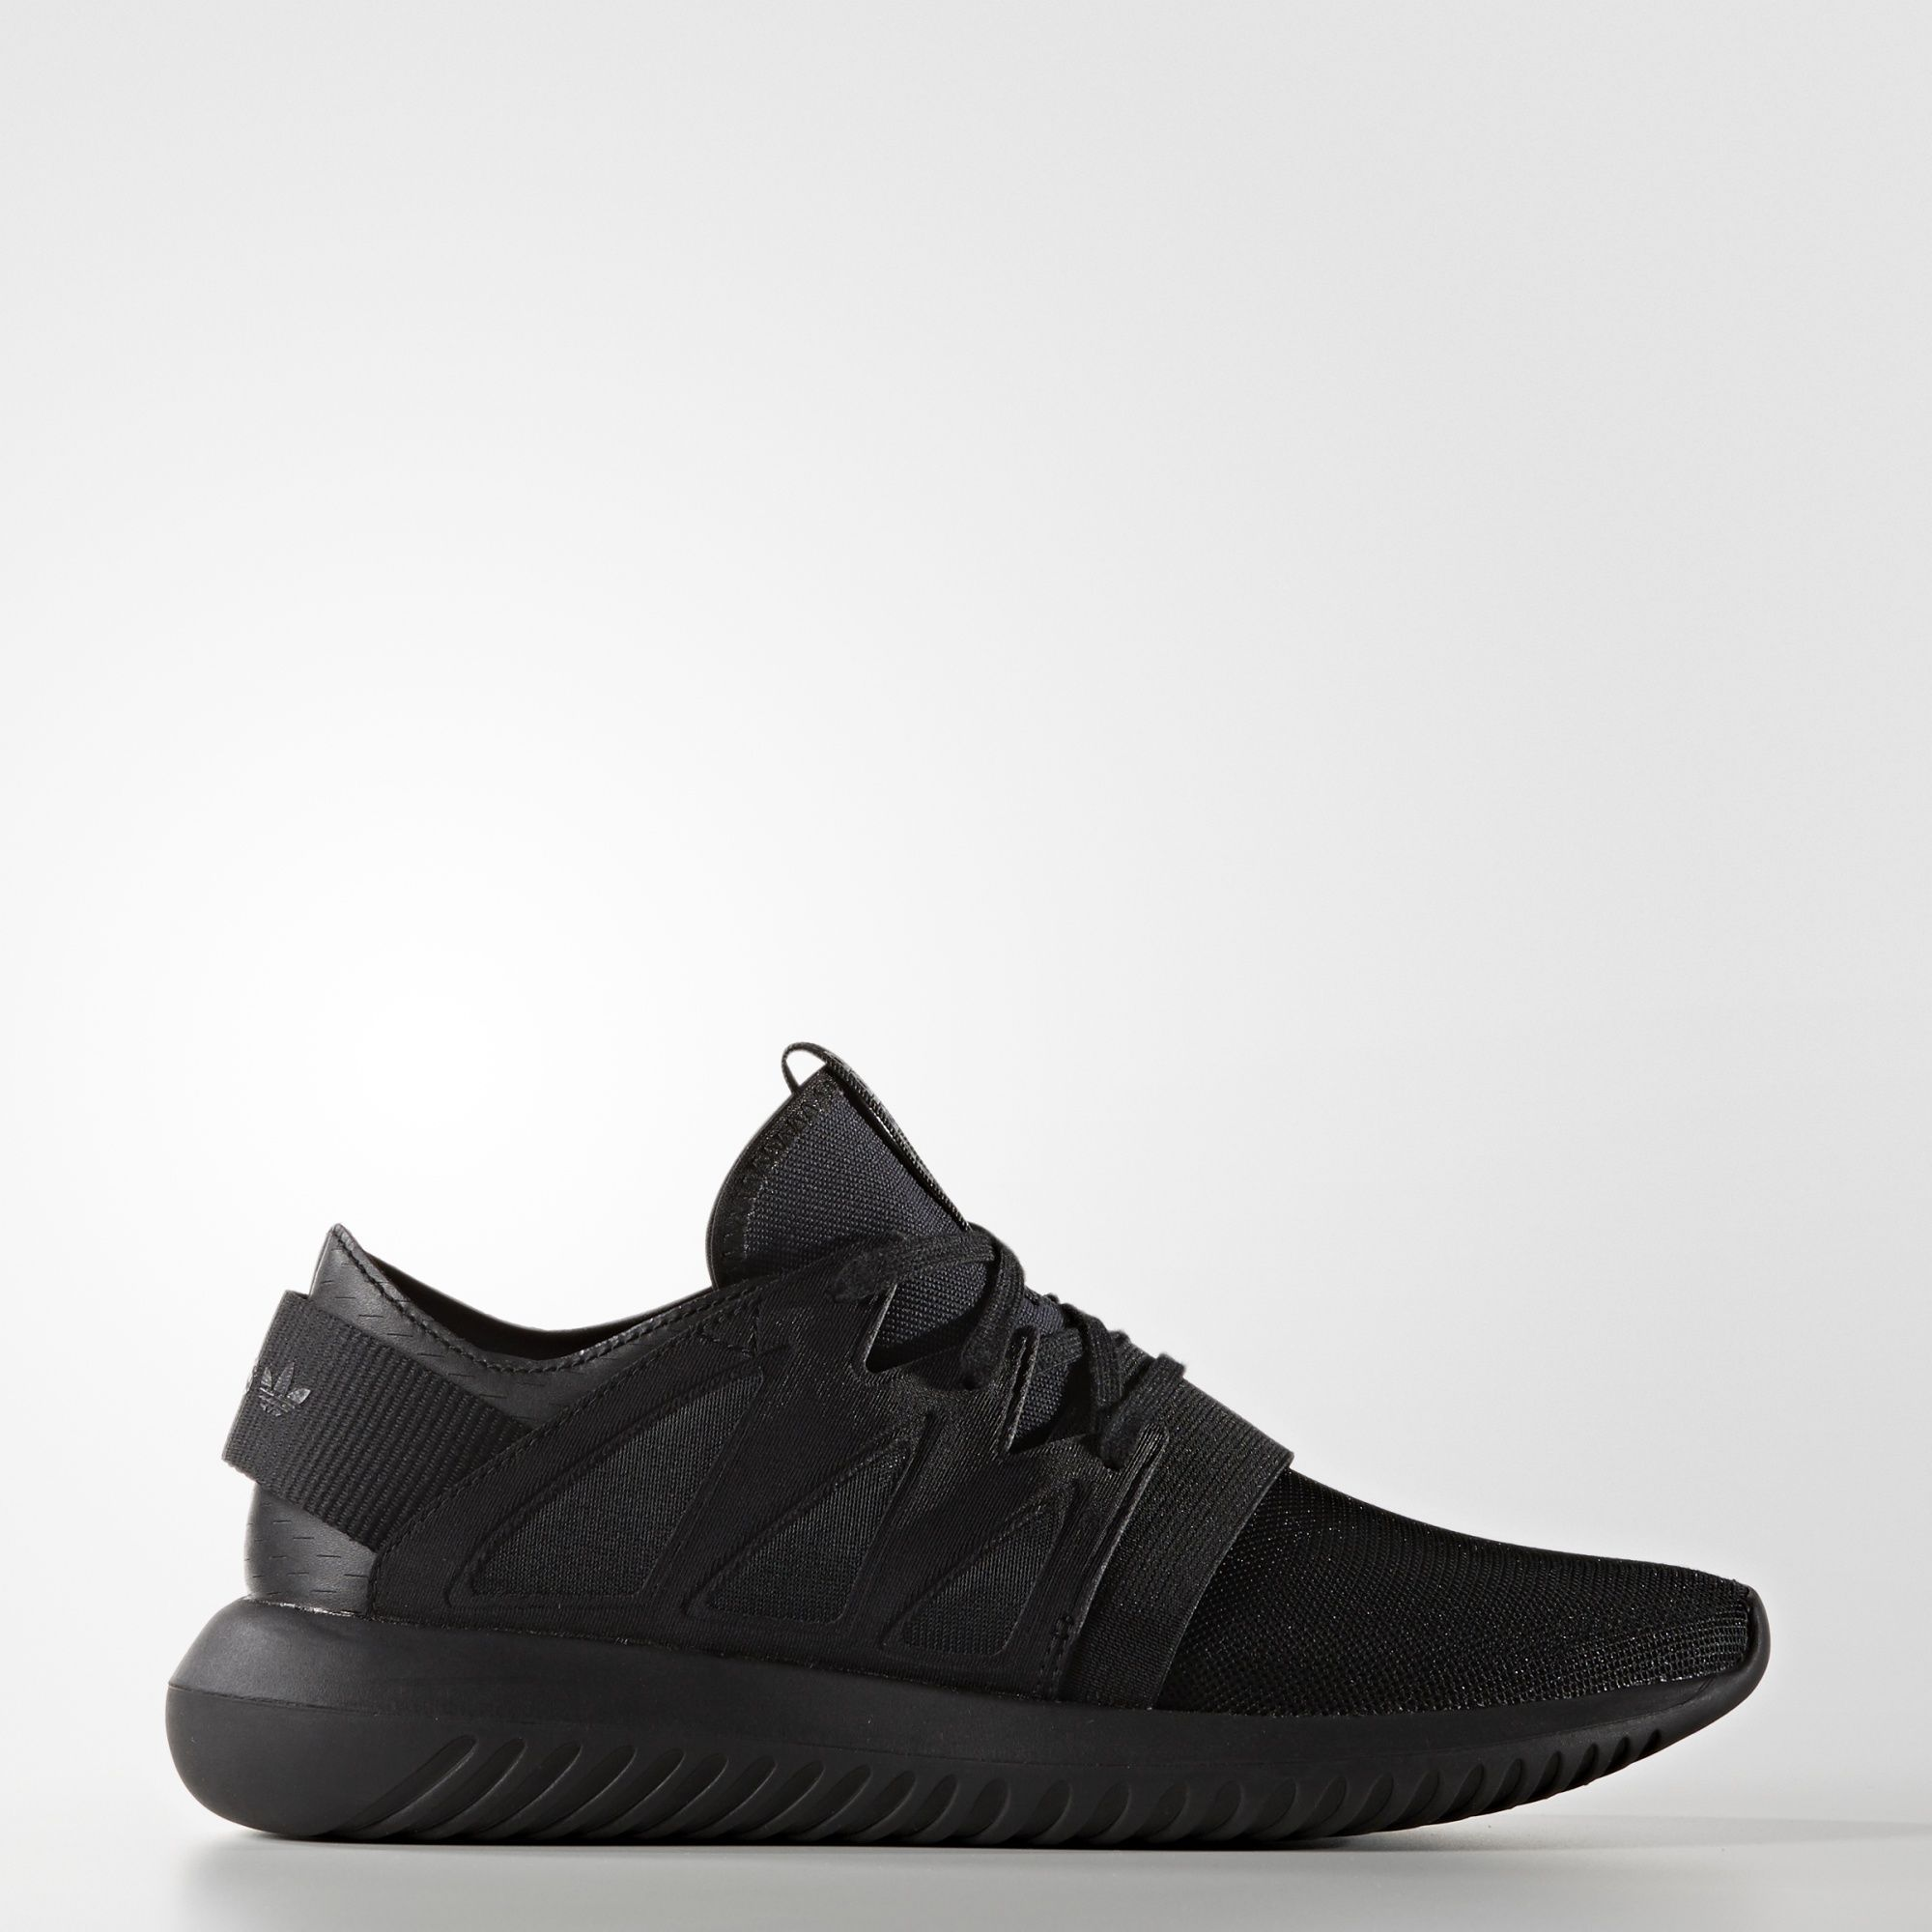 Adidas Tubular Viral Triple Black